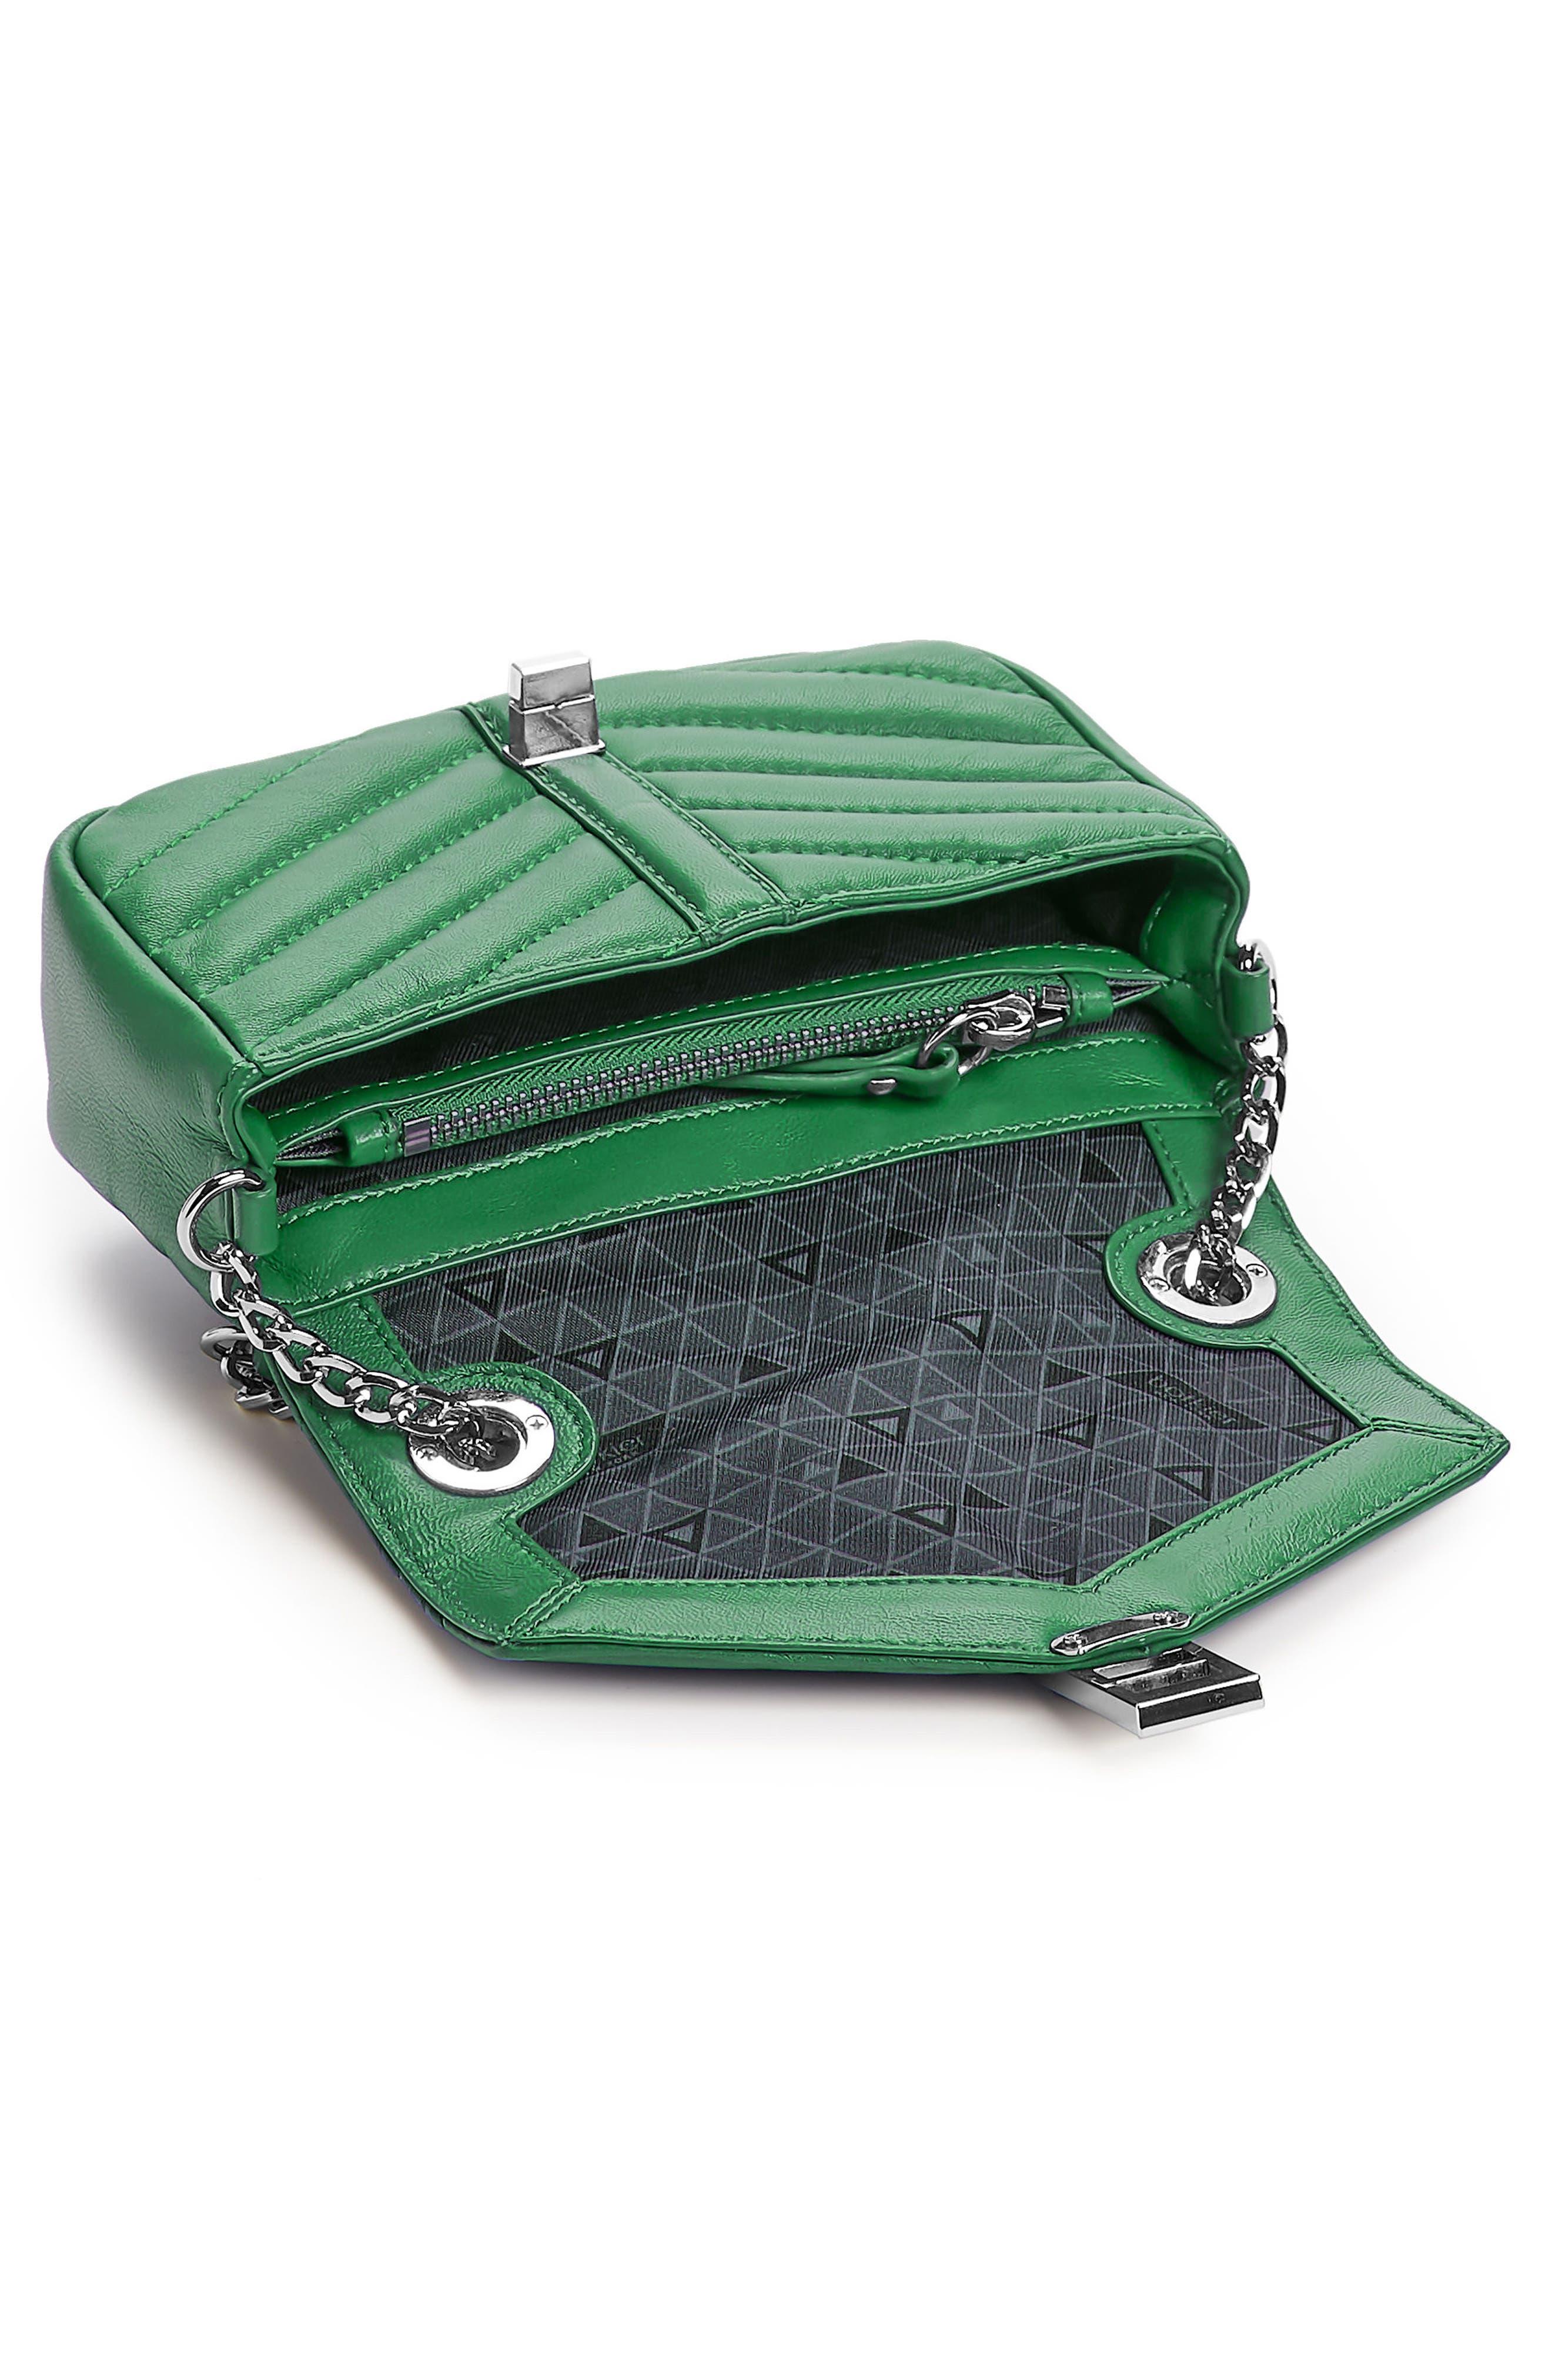 Dakota Quilted Leather Crossbody Bag,                             Alternate thumbnail 2, color,                             GREEN